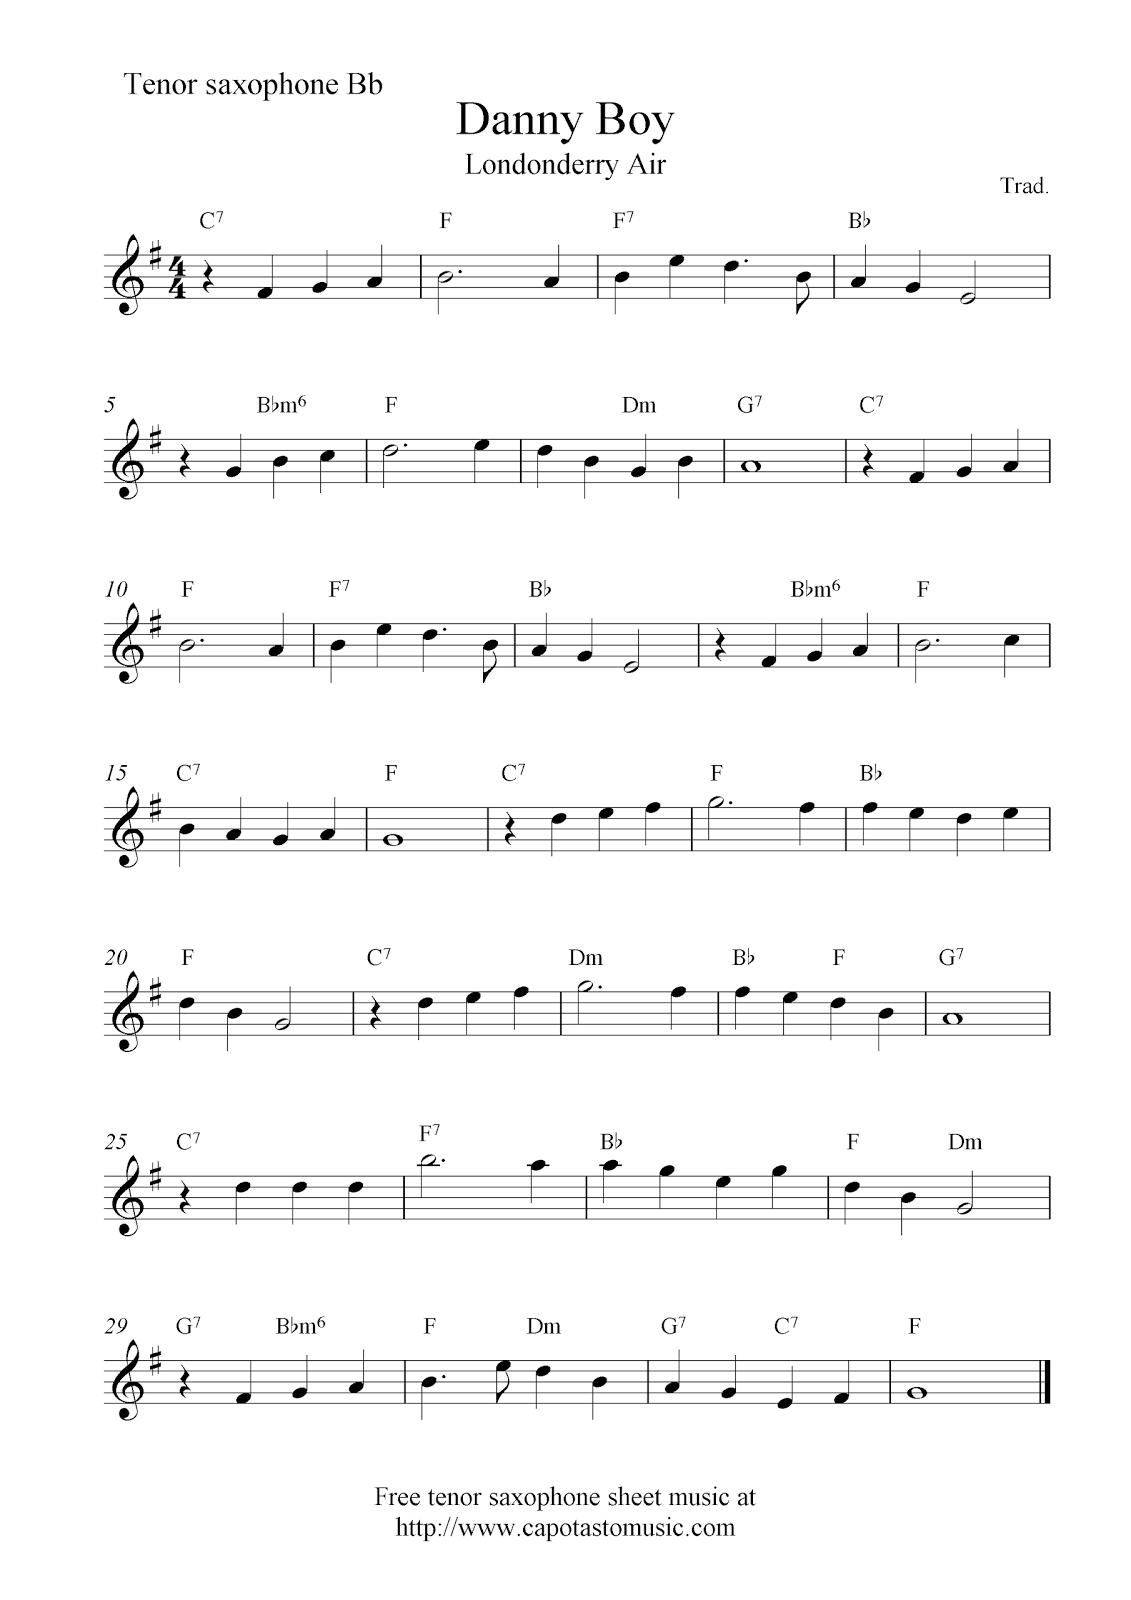 Danny Boy (Londonderry Air), free tenor saxophone sheet music notes